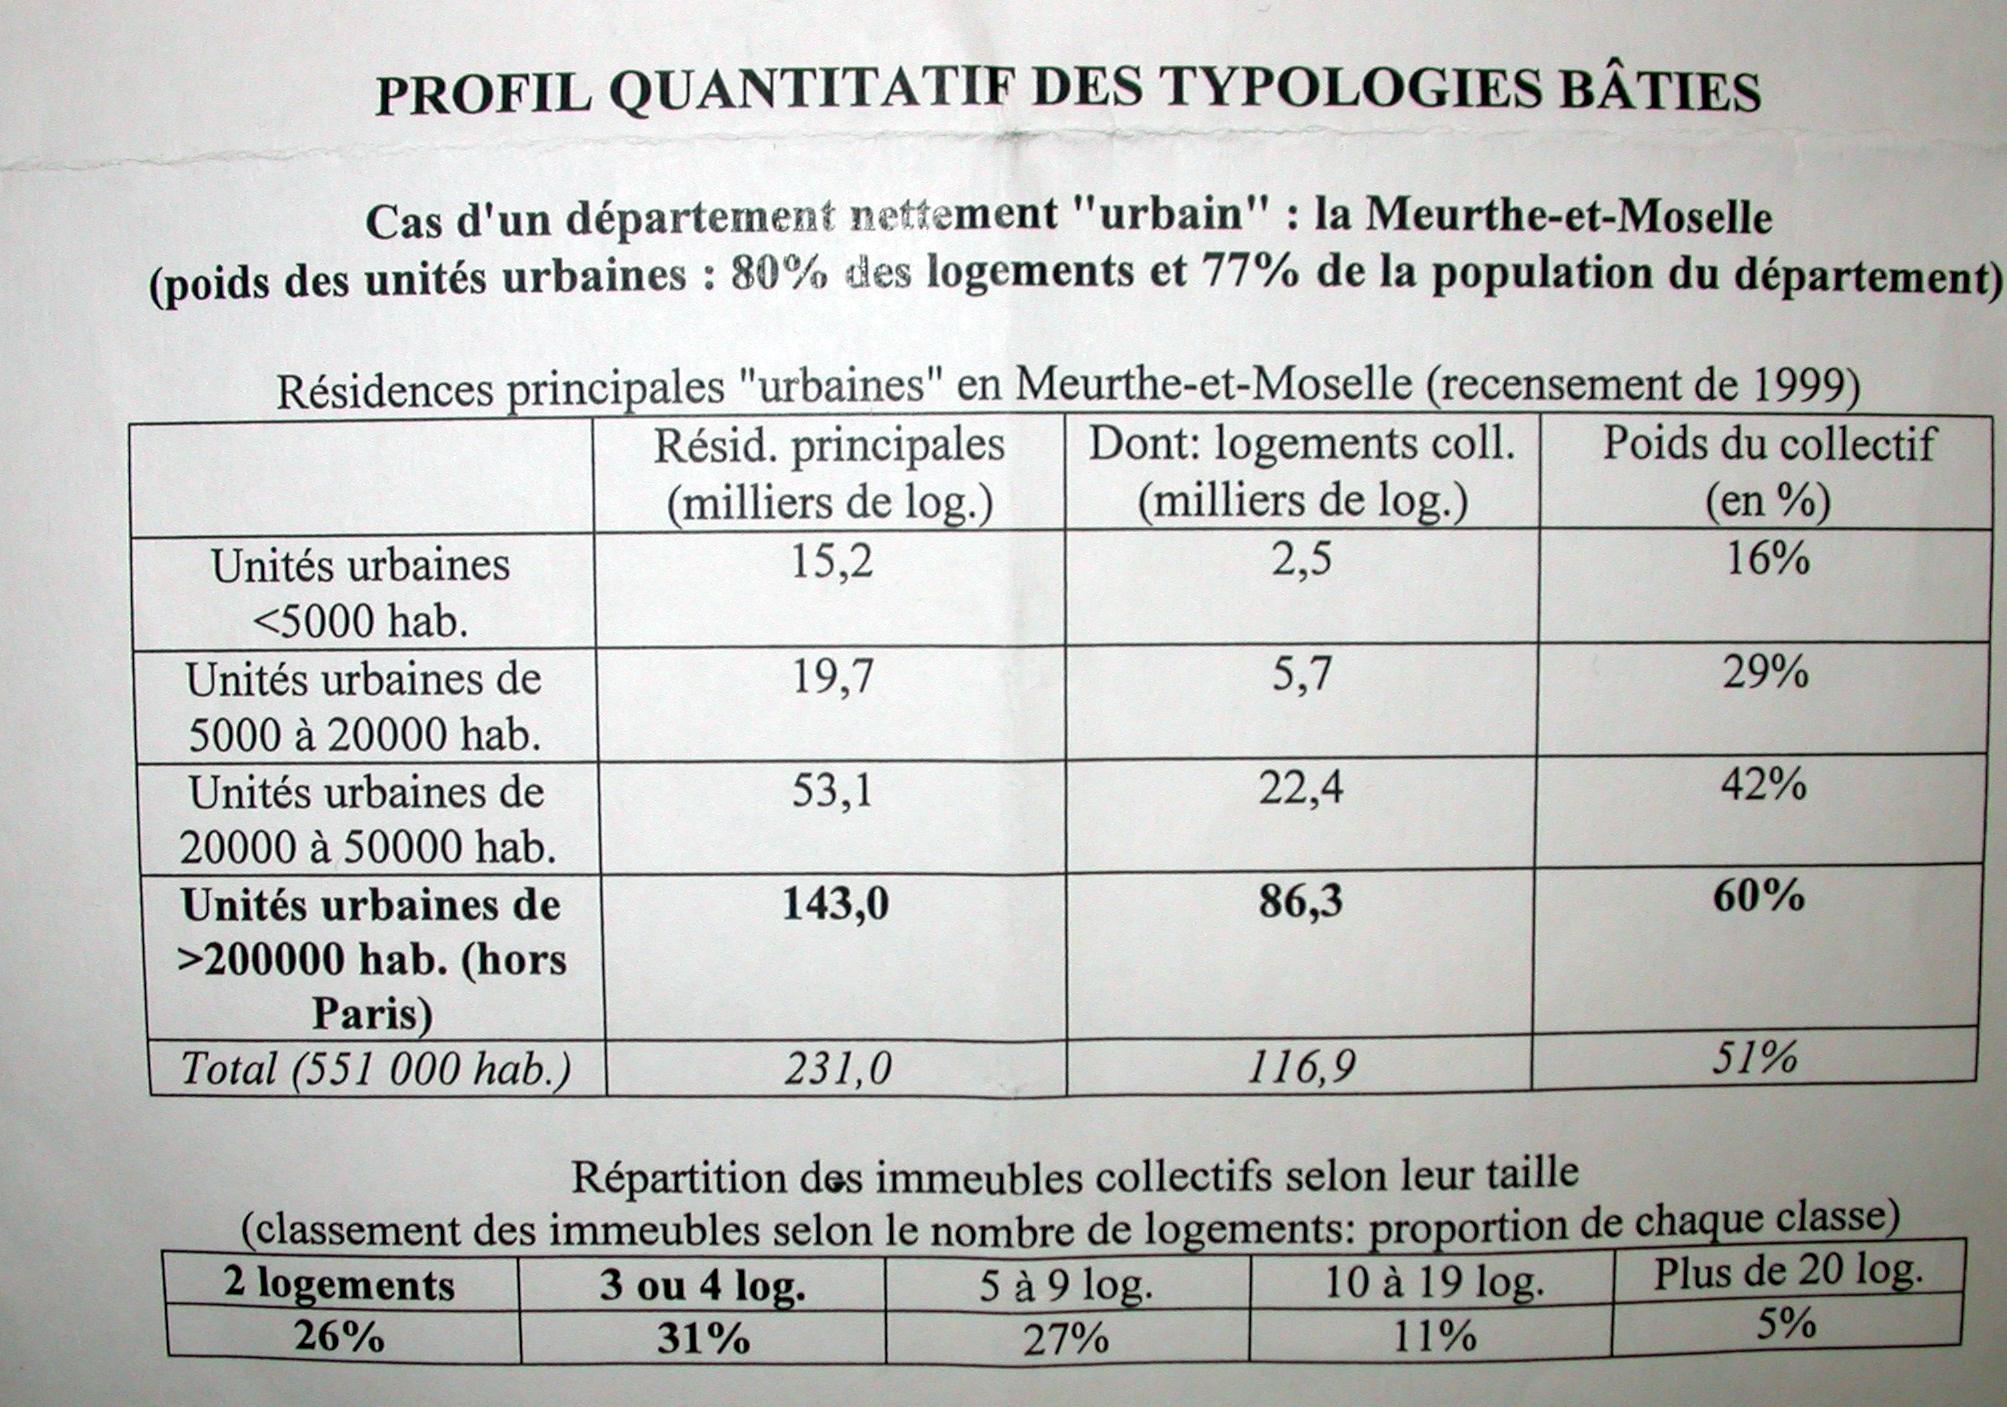 profilquantitatifdestypologiesbaties.jpg